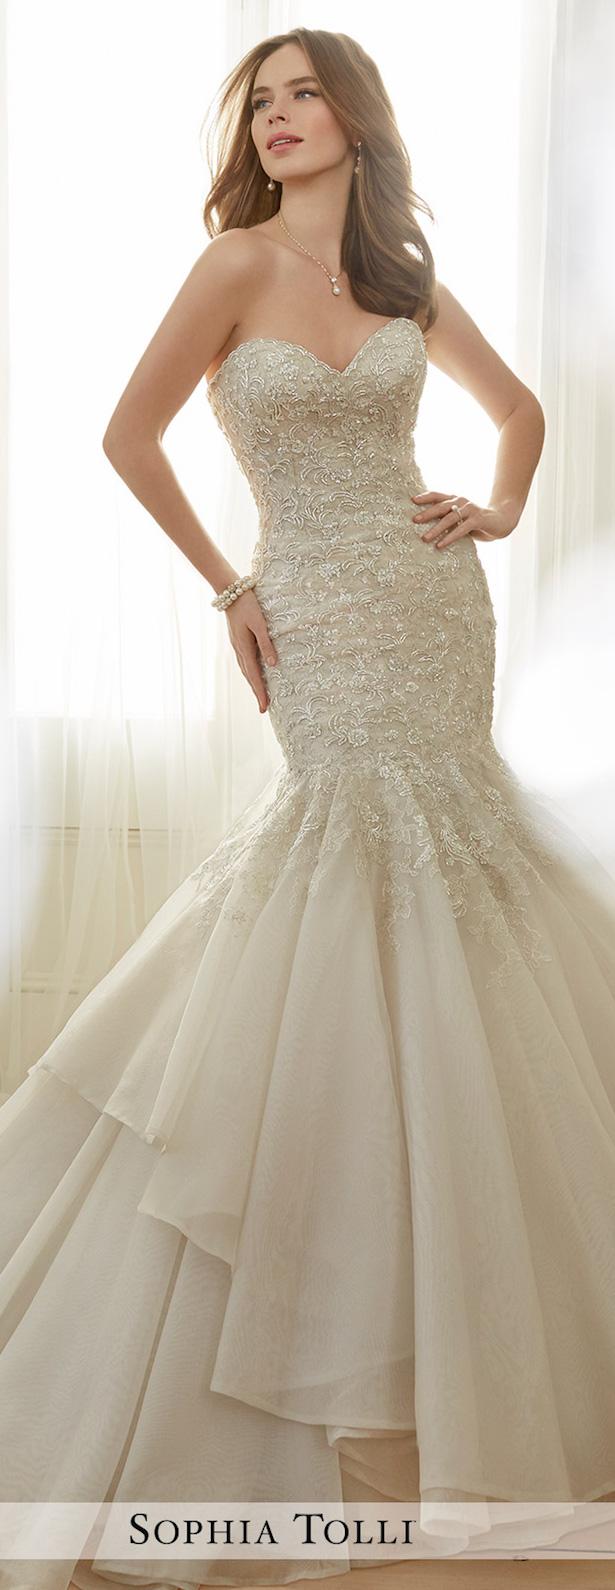 Sophia Tolli Spring 2017 Wedding Dress Collection